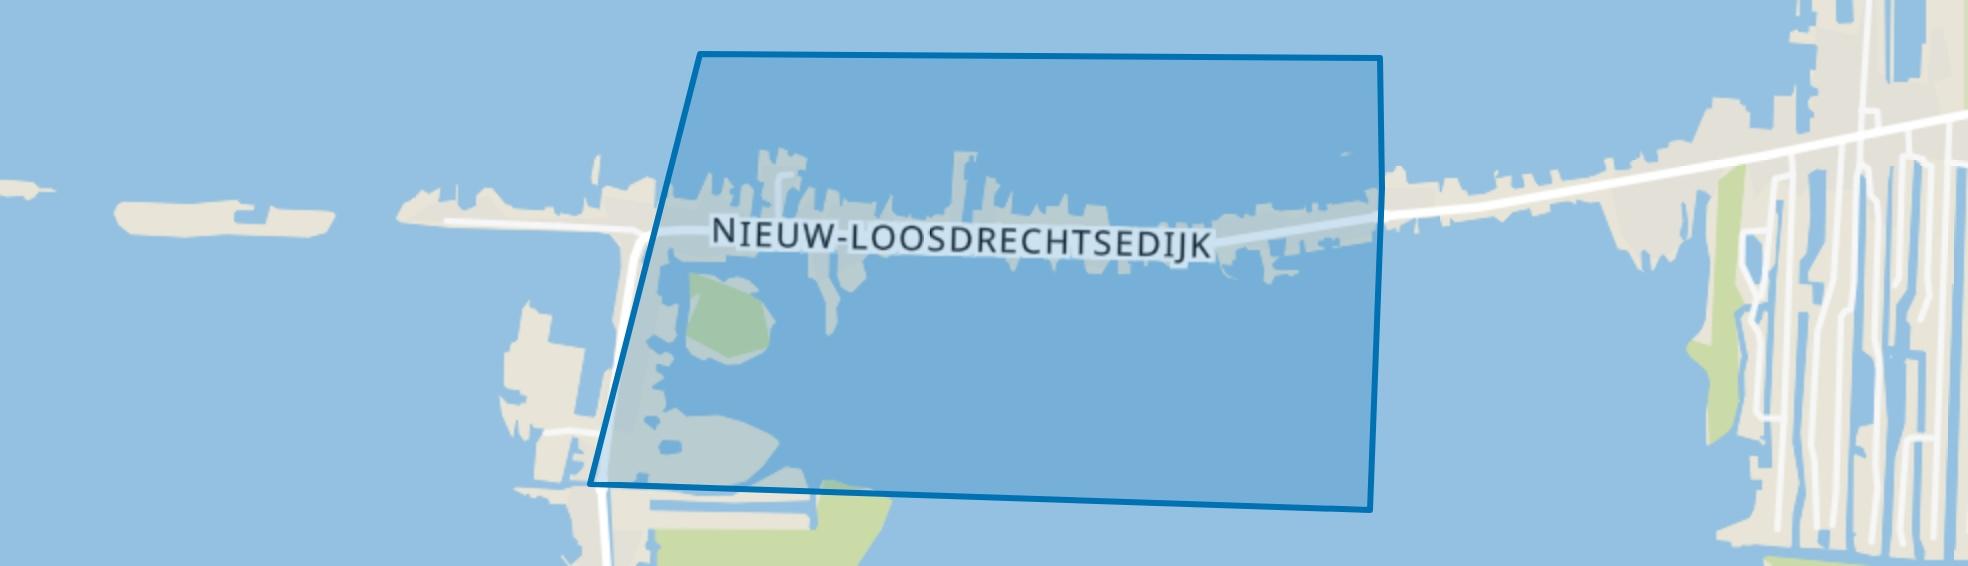 Muijeveld, Loosdrecht map